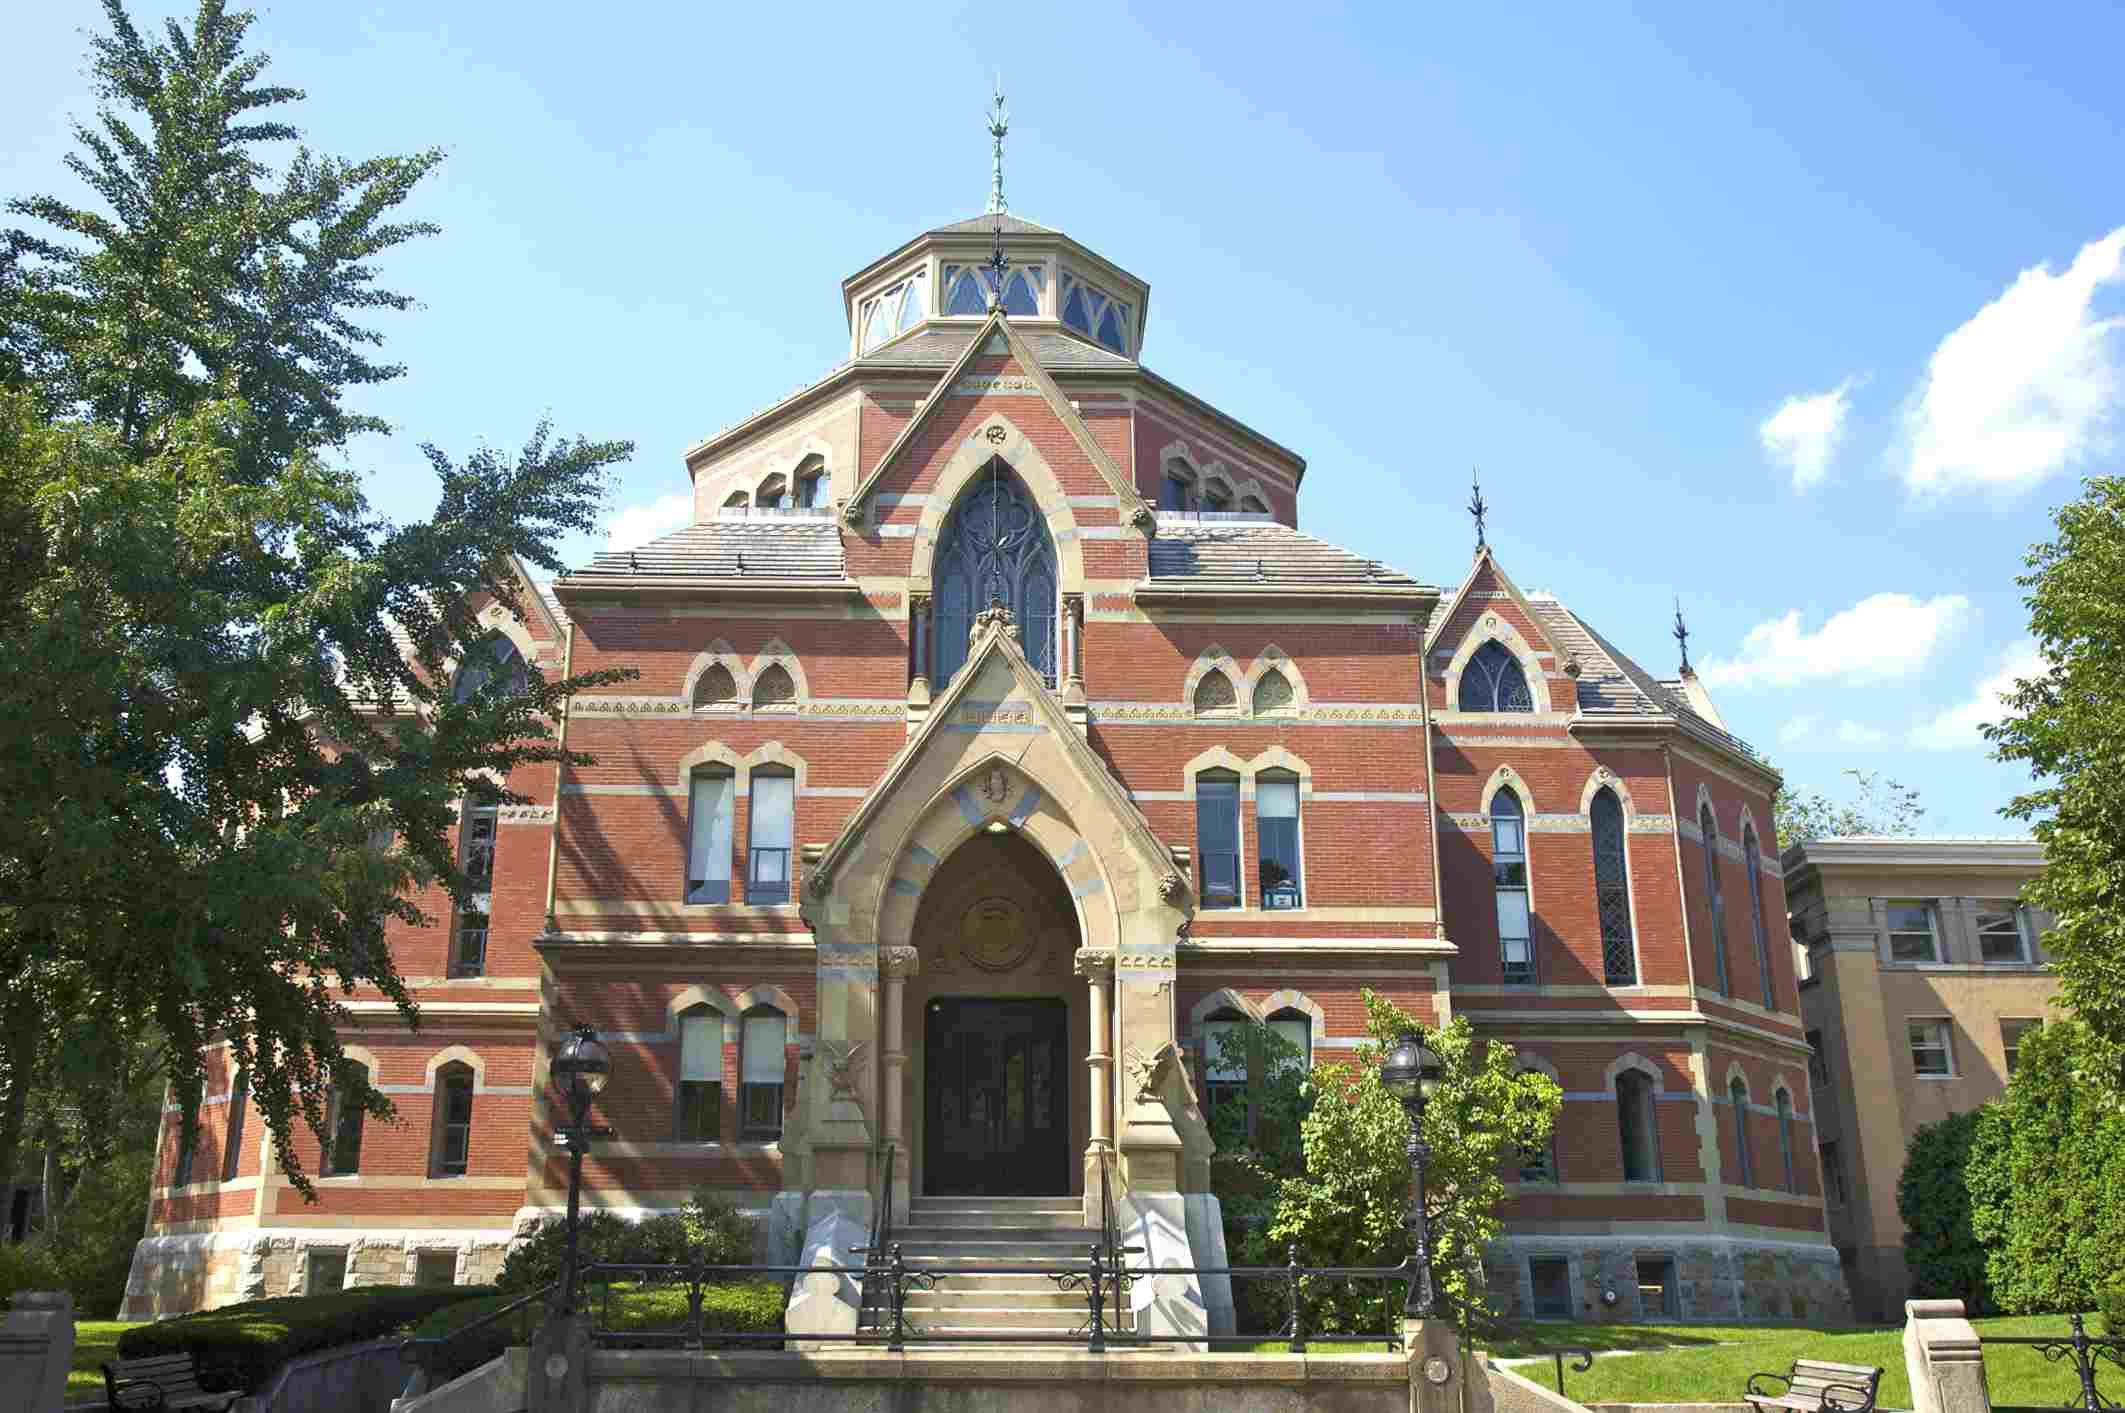 Ivy League Schools: Acceptance Rates, Location & More